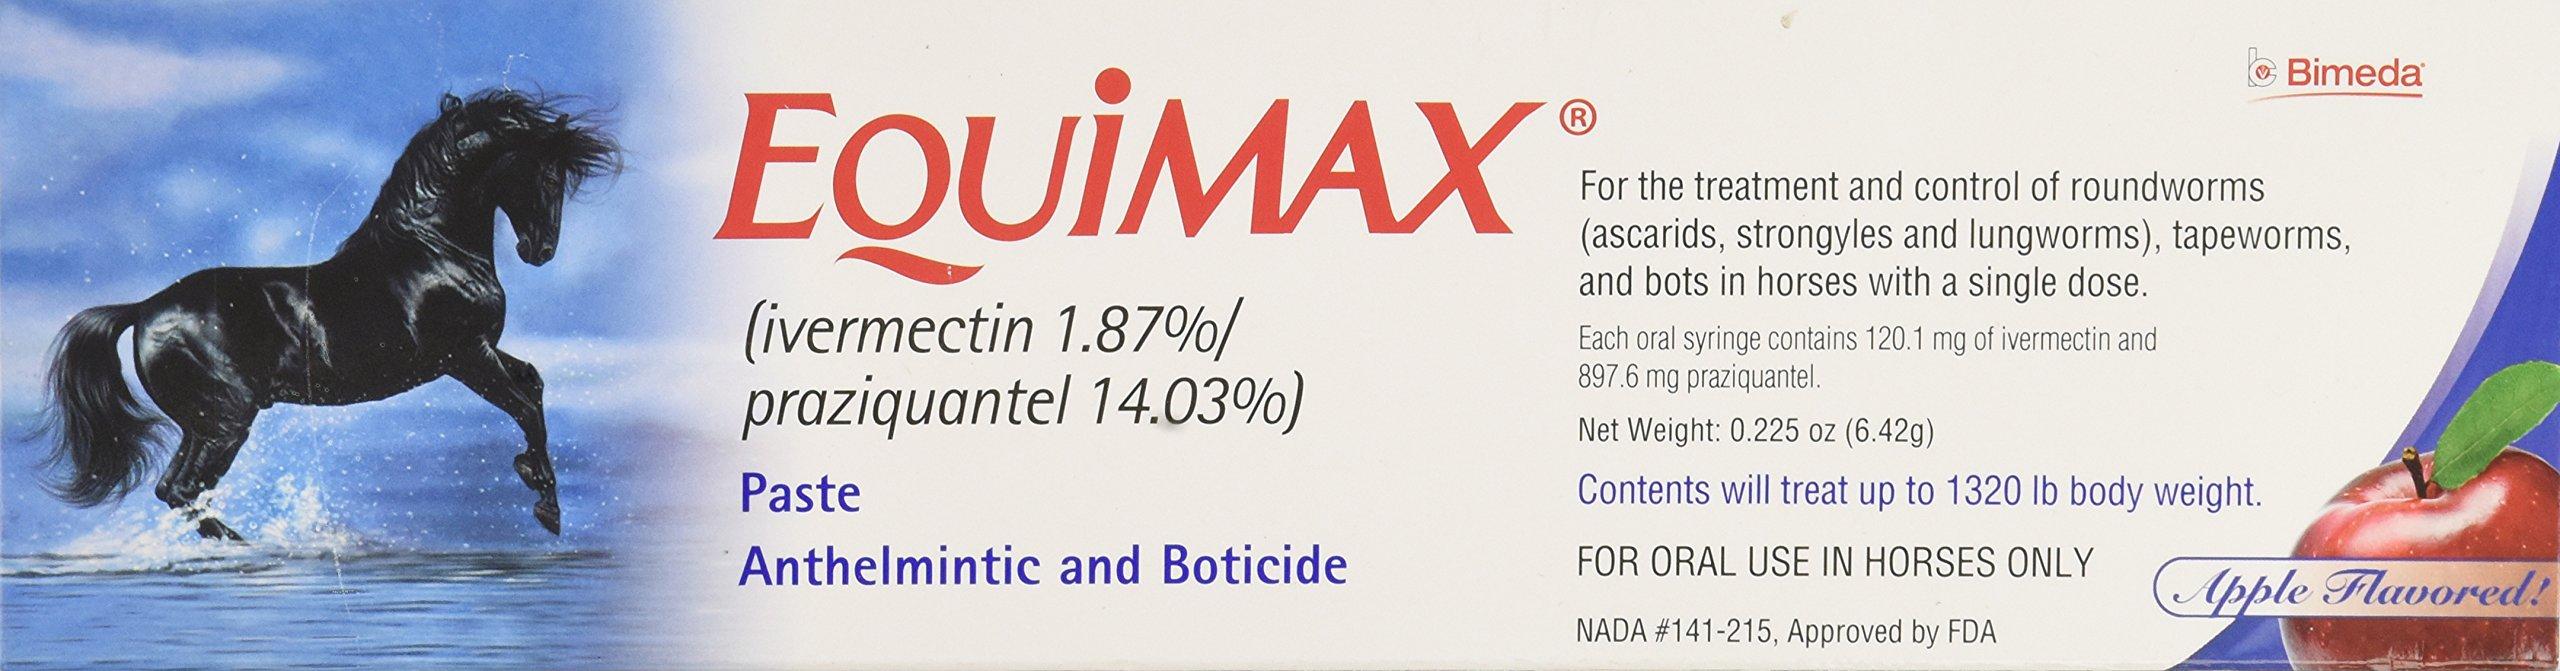 Bimeda EQUIMAX Equine Deworm Paste for Horses, Ivermectin 1.87-Percent and Praziquantel 14.03-Percent, 6.42gm